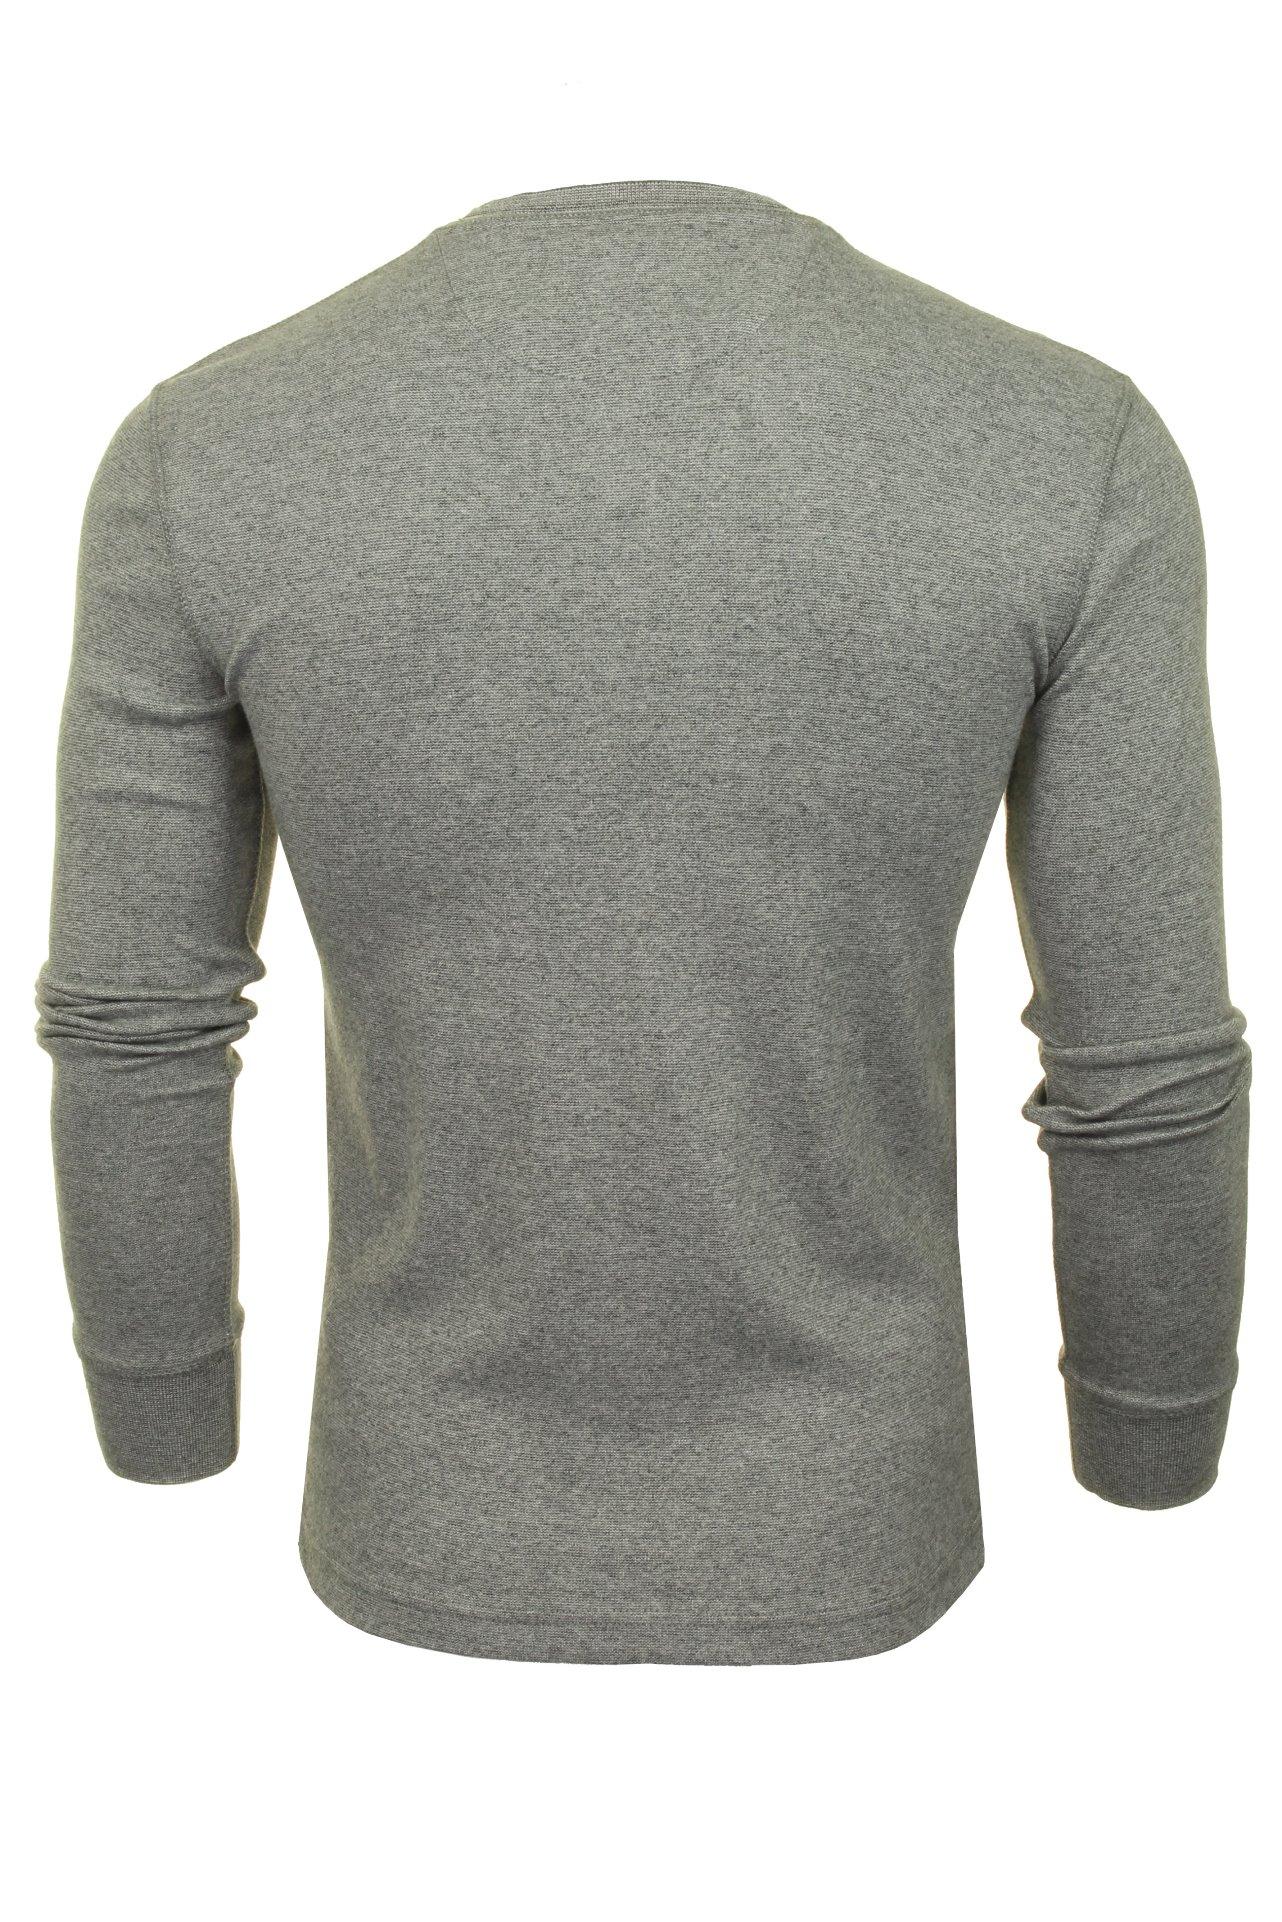 Camiseta-para-hombre-Superdry-Grandad-039-manga-larga-Heritage-Grandad-039 miniatura 8